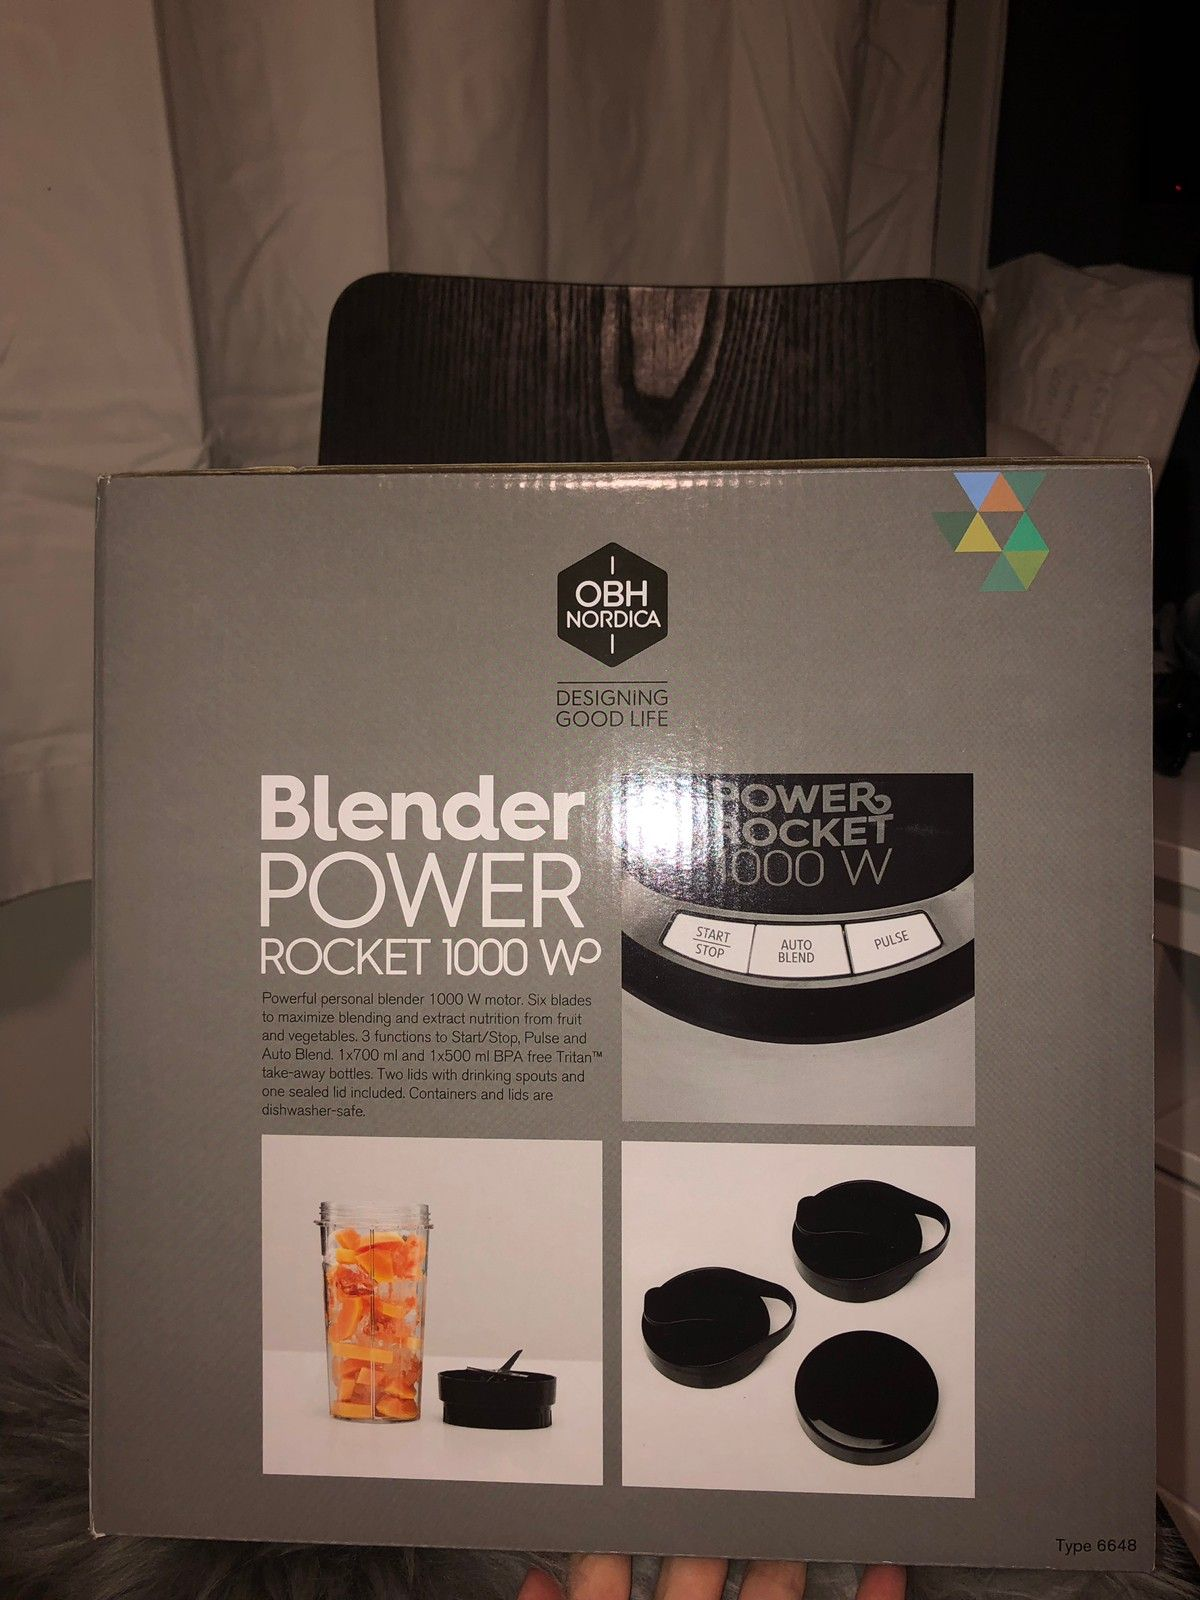 UÅPNET OBH NORDICA POWER ROCKET BLENDER 6648  d3bfa68067cd6